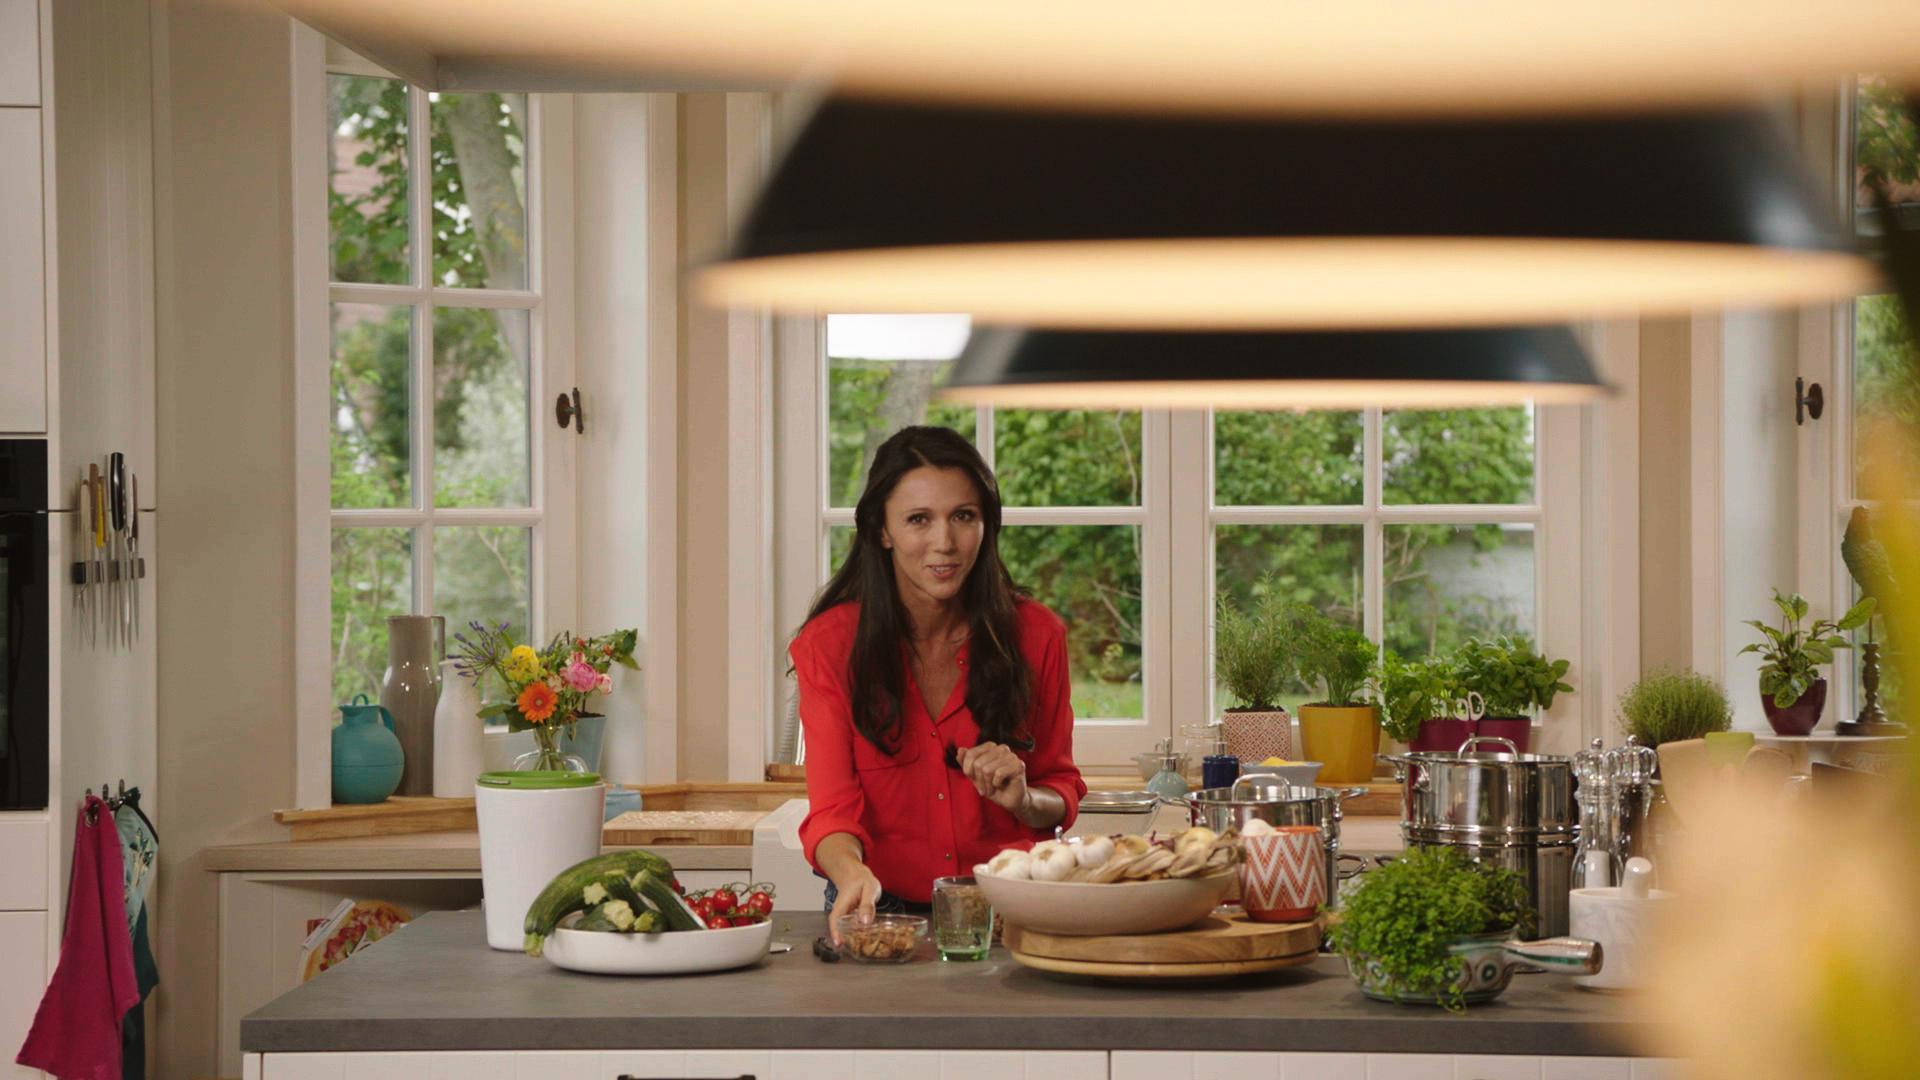 Wrap Folie Keuken : Open keuken wraps veganistisch writerinheels